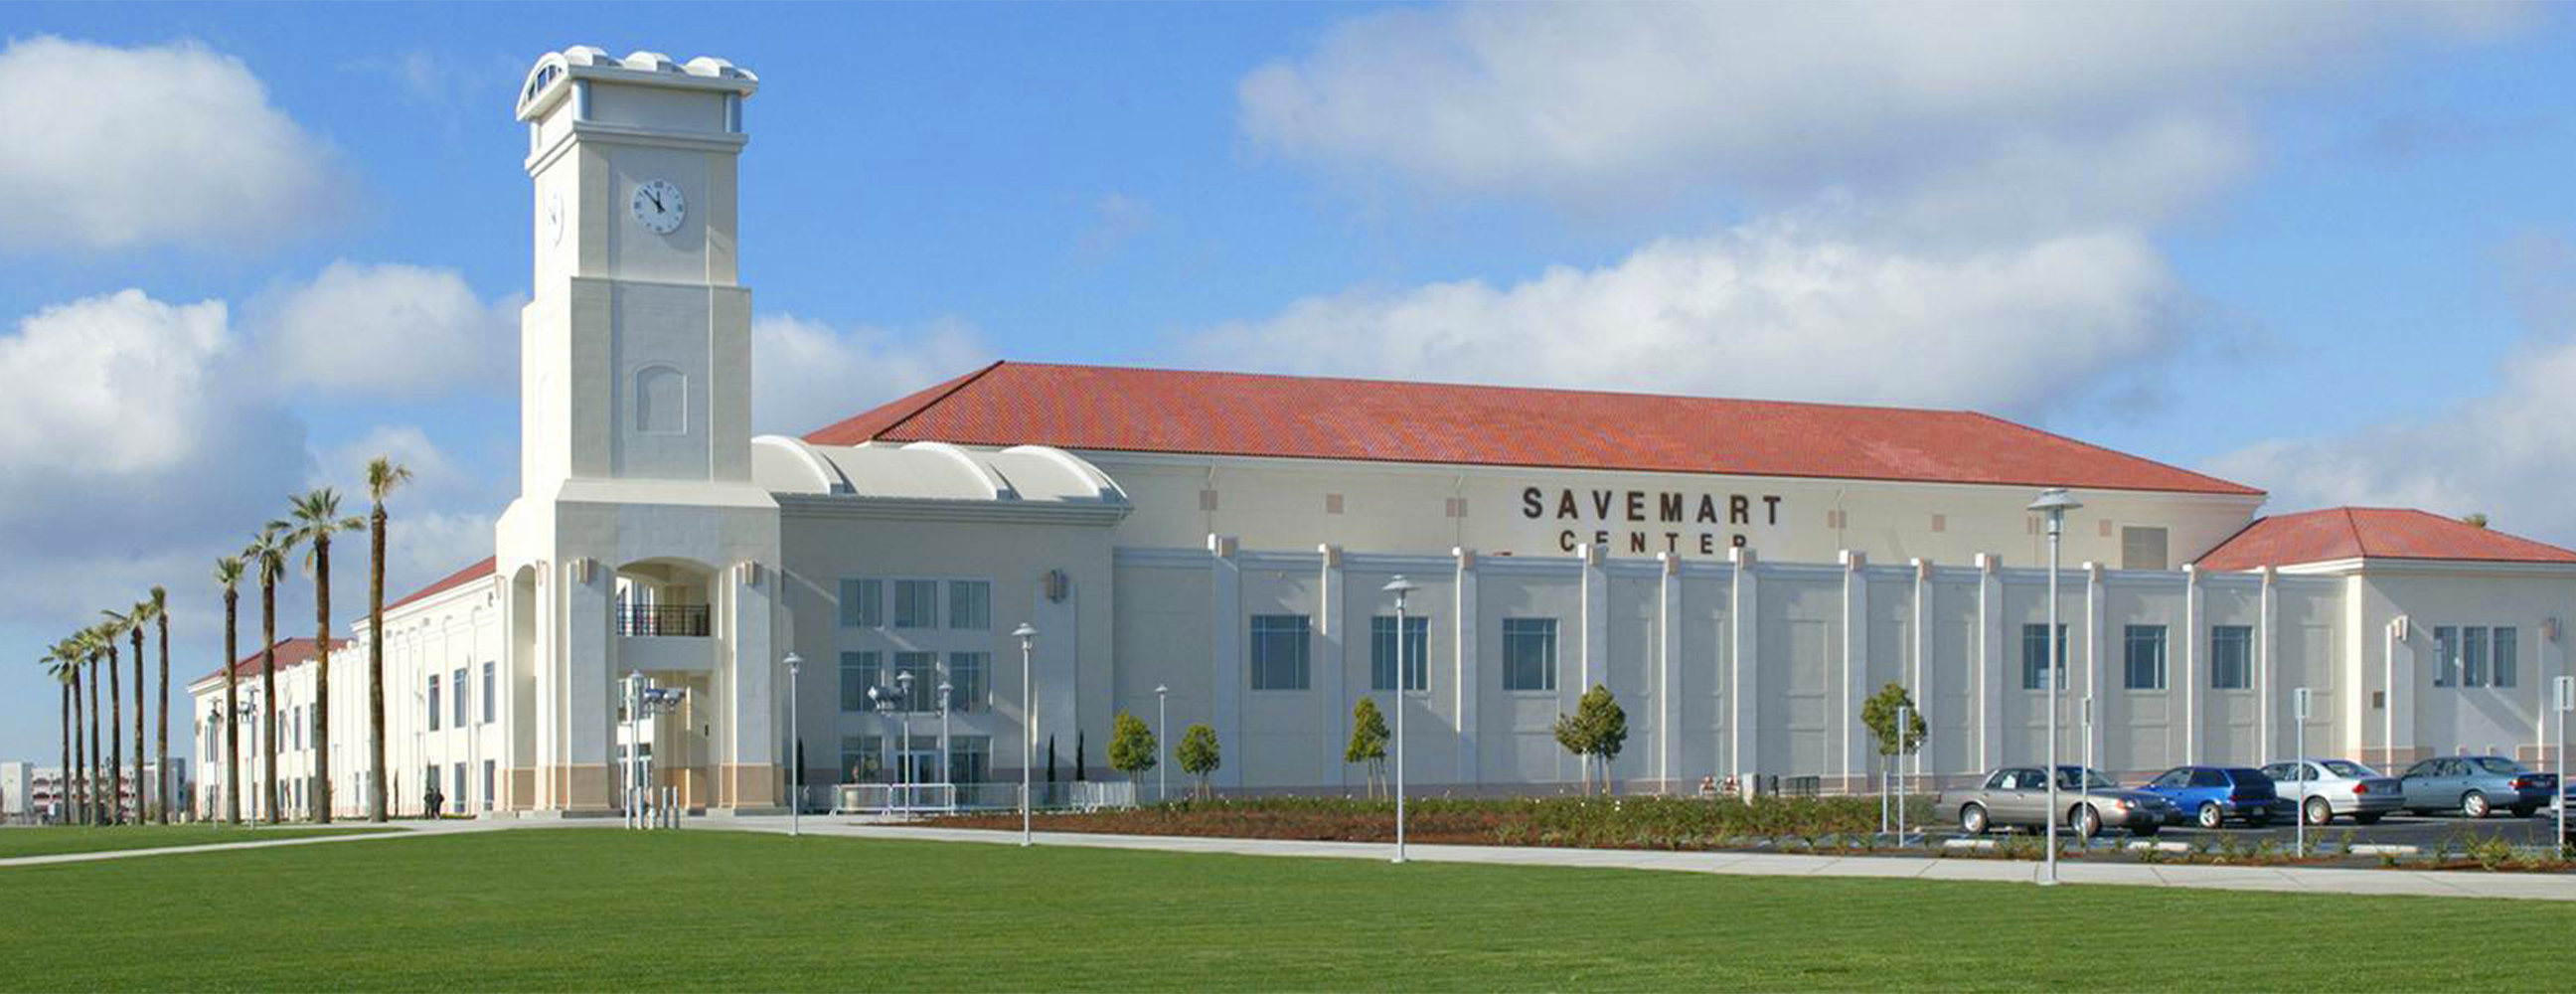 Savemart Center exterior